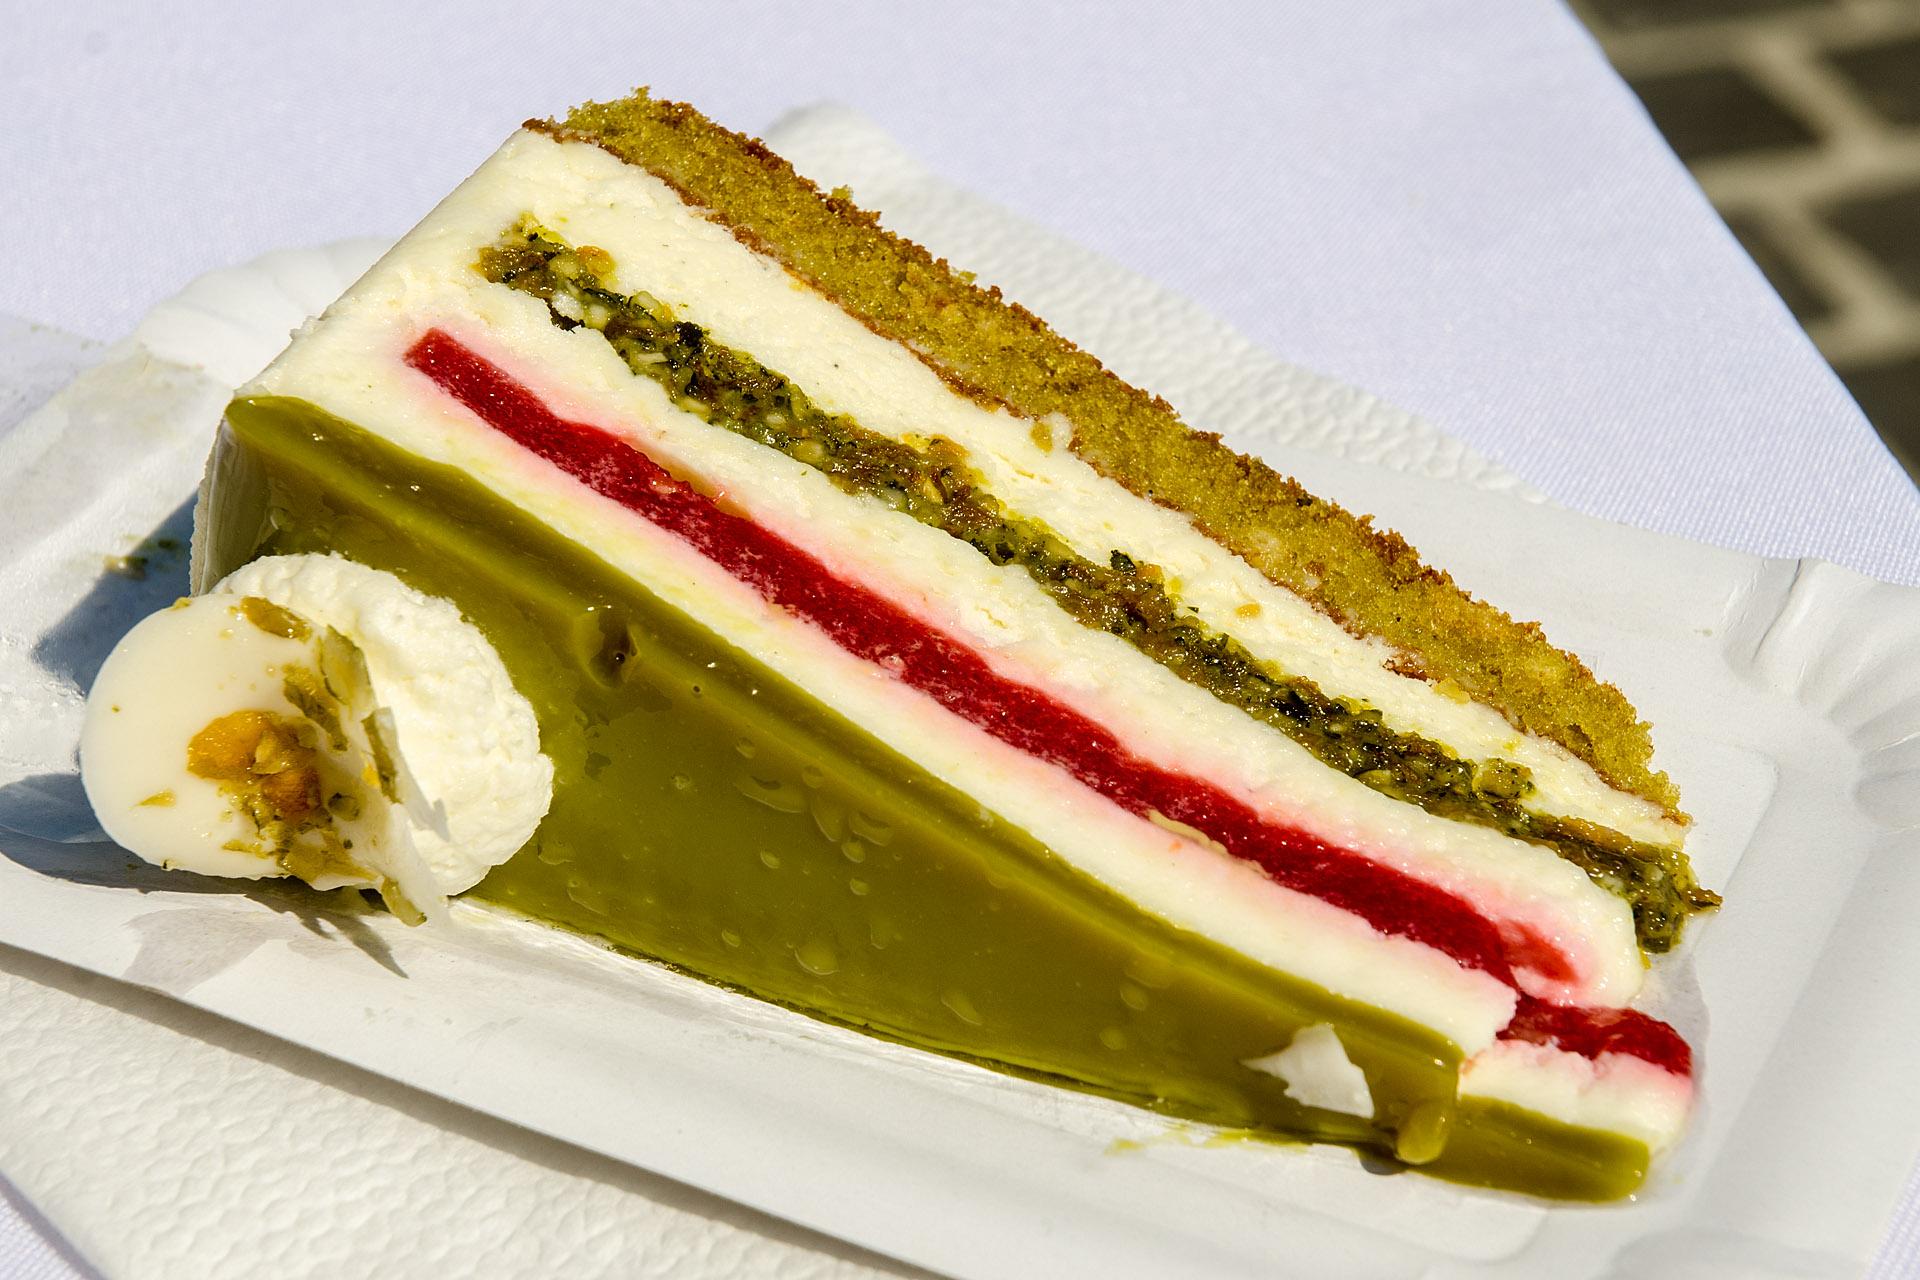 'National cake' (Green Gold of Orseg)